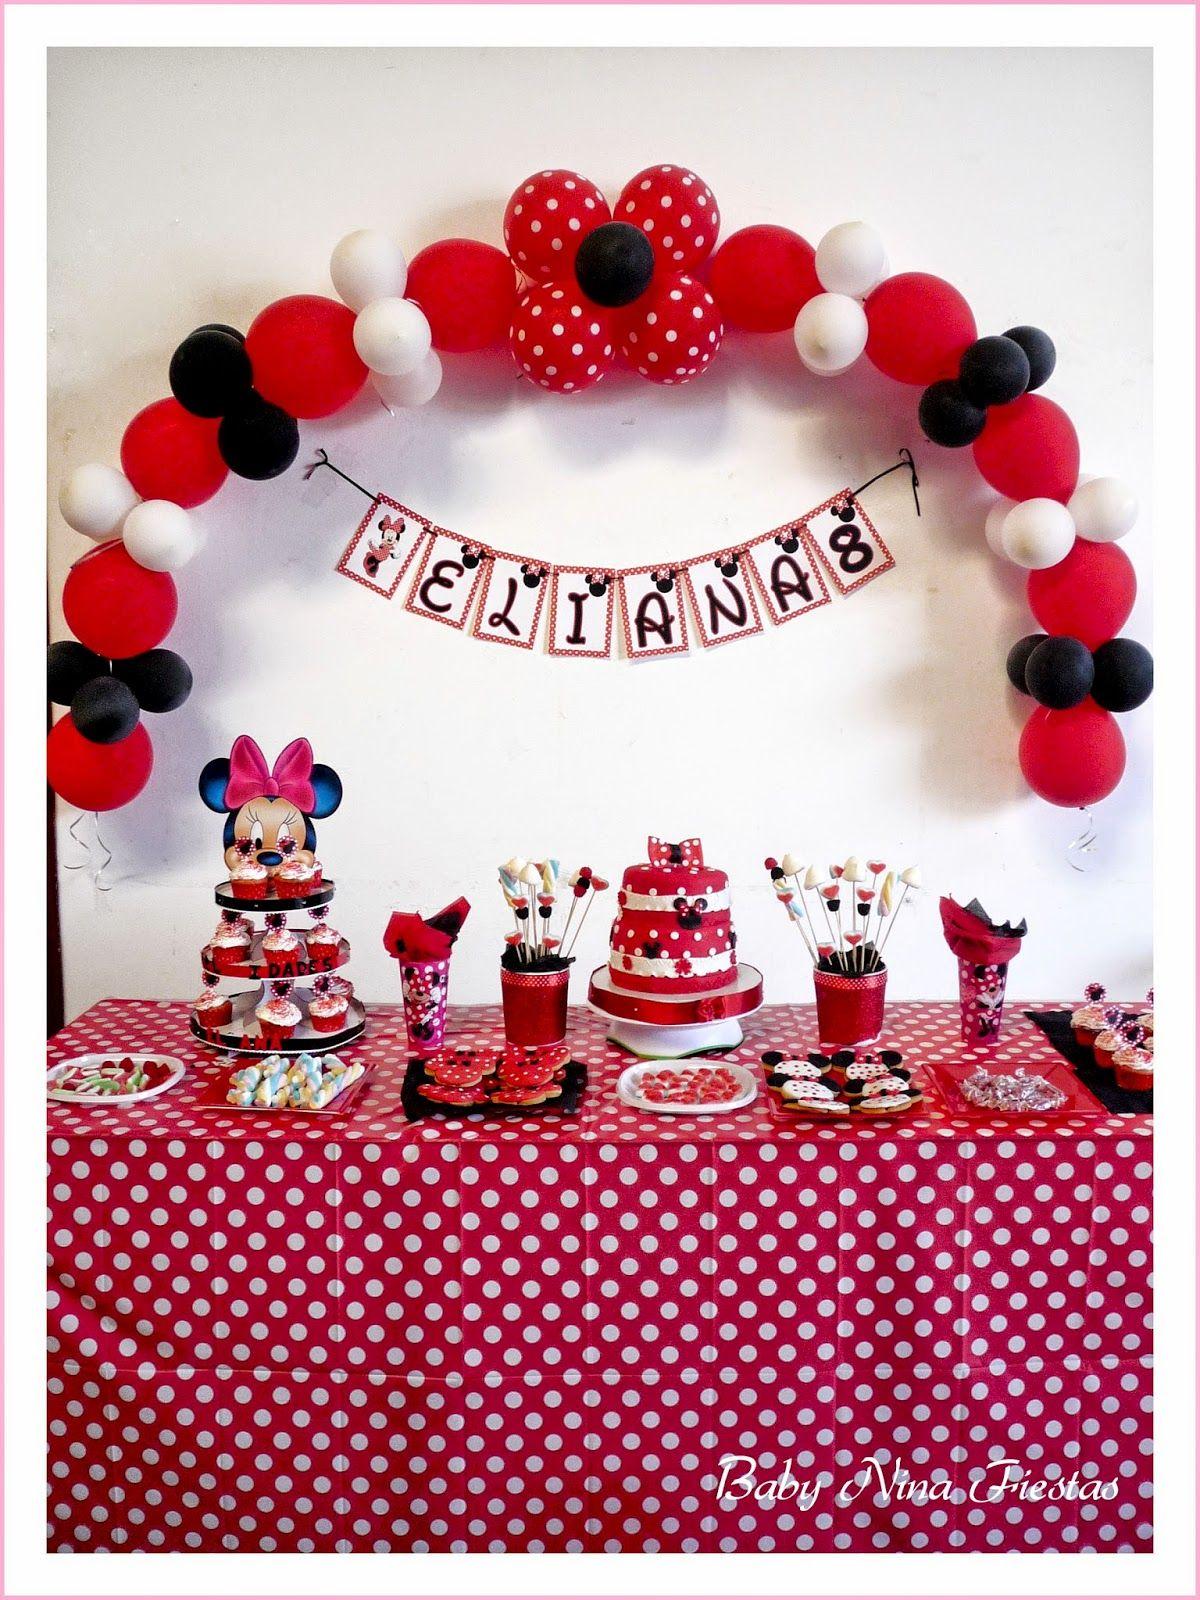 Baby nina fiestas decoraci n para el cumple minnie mouse for Decoracion minnie mouse